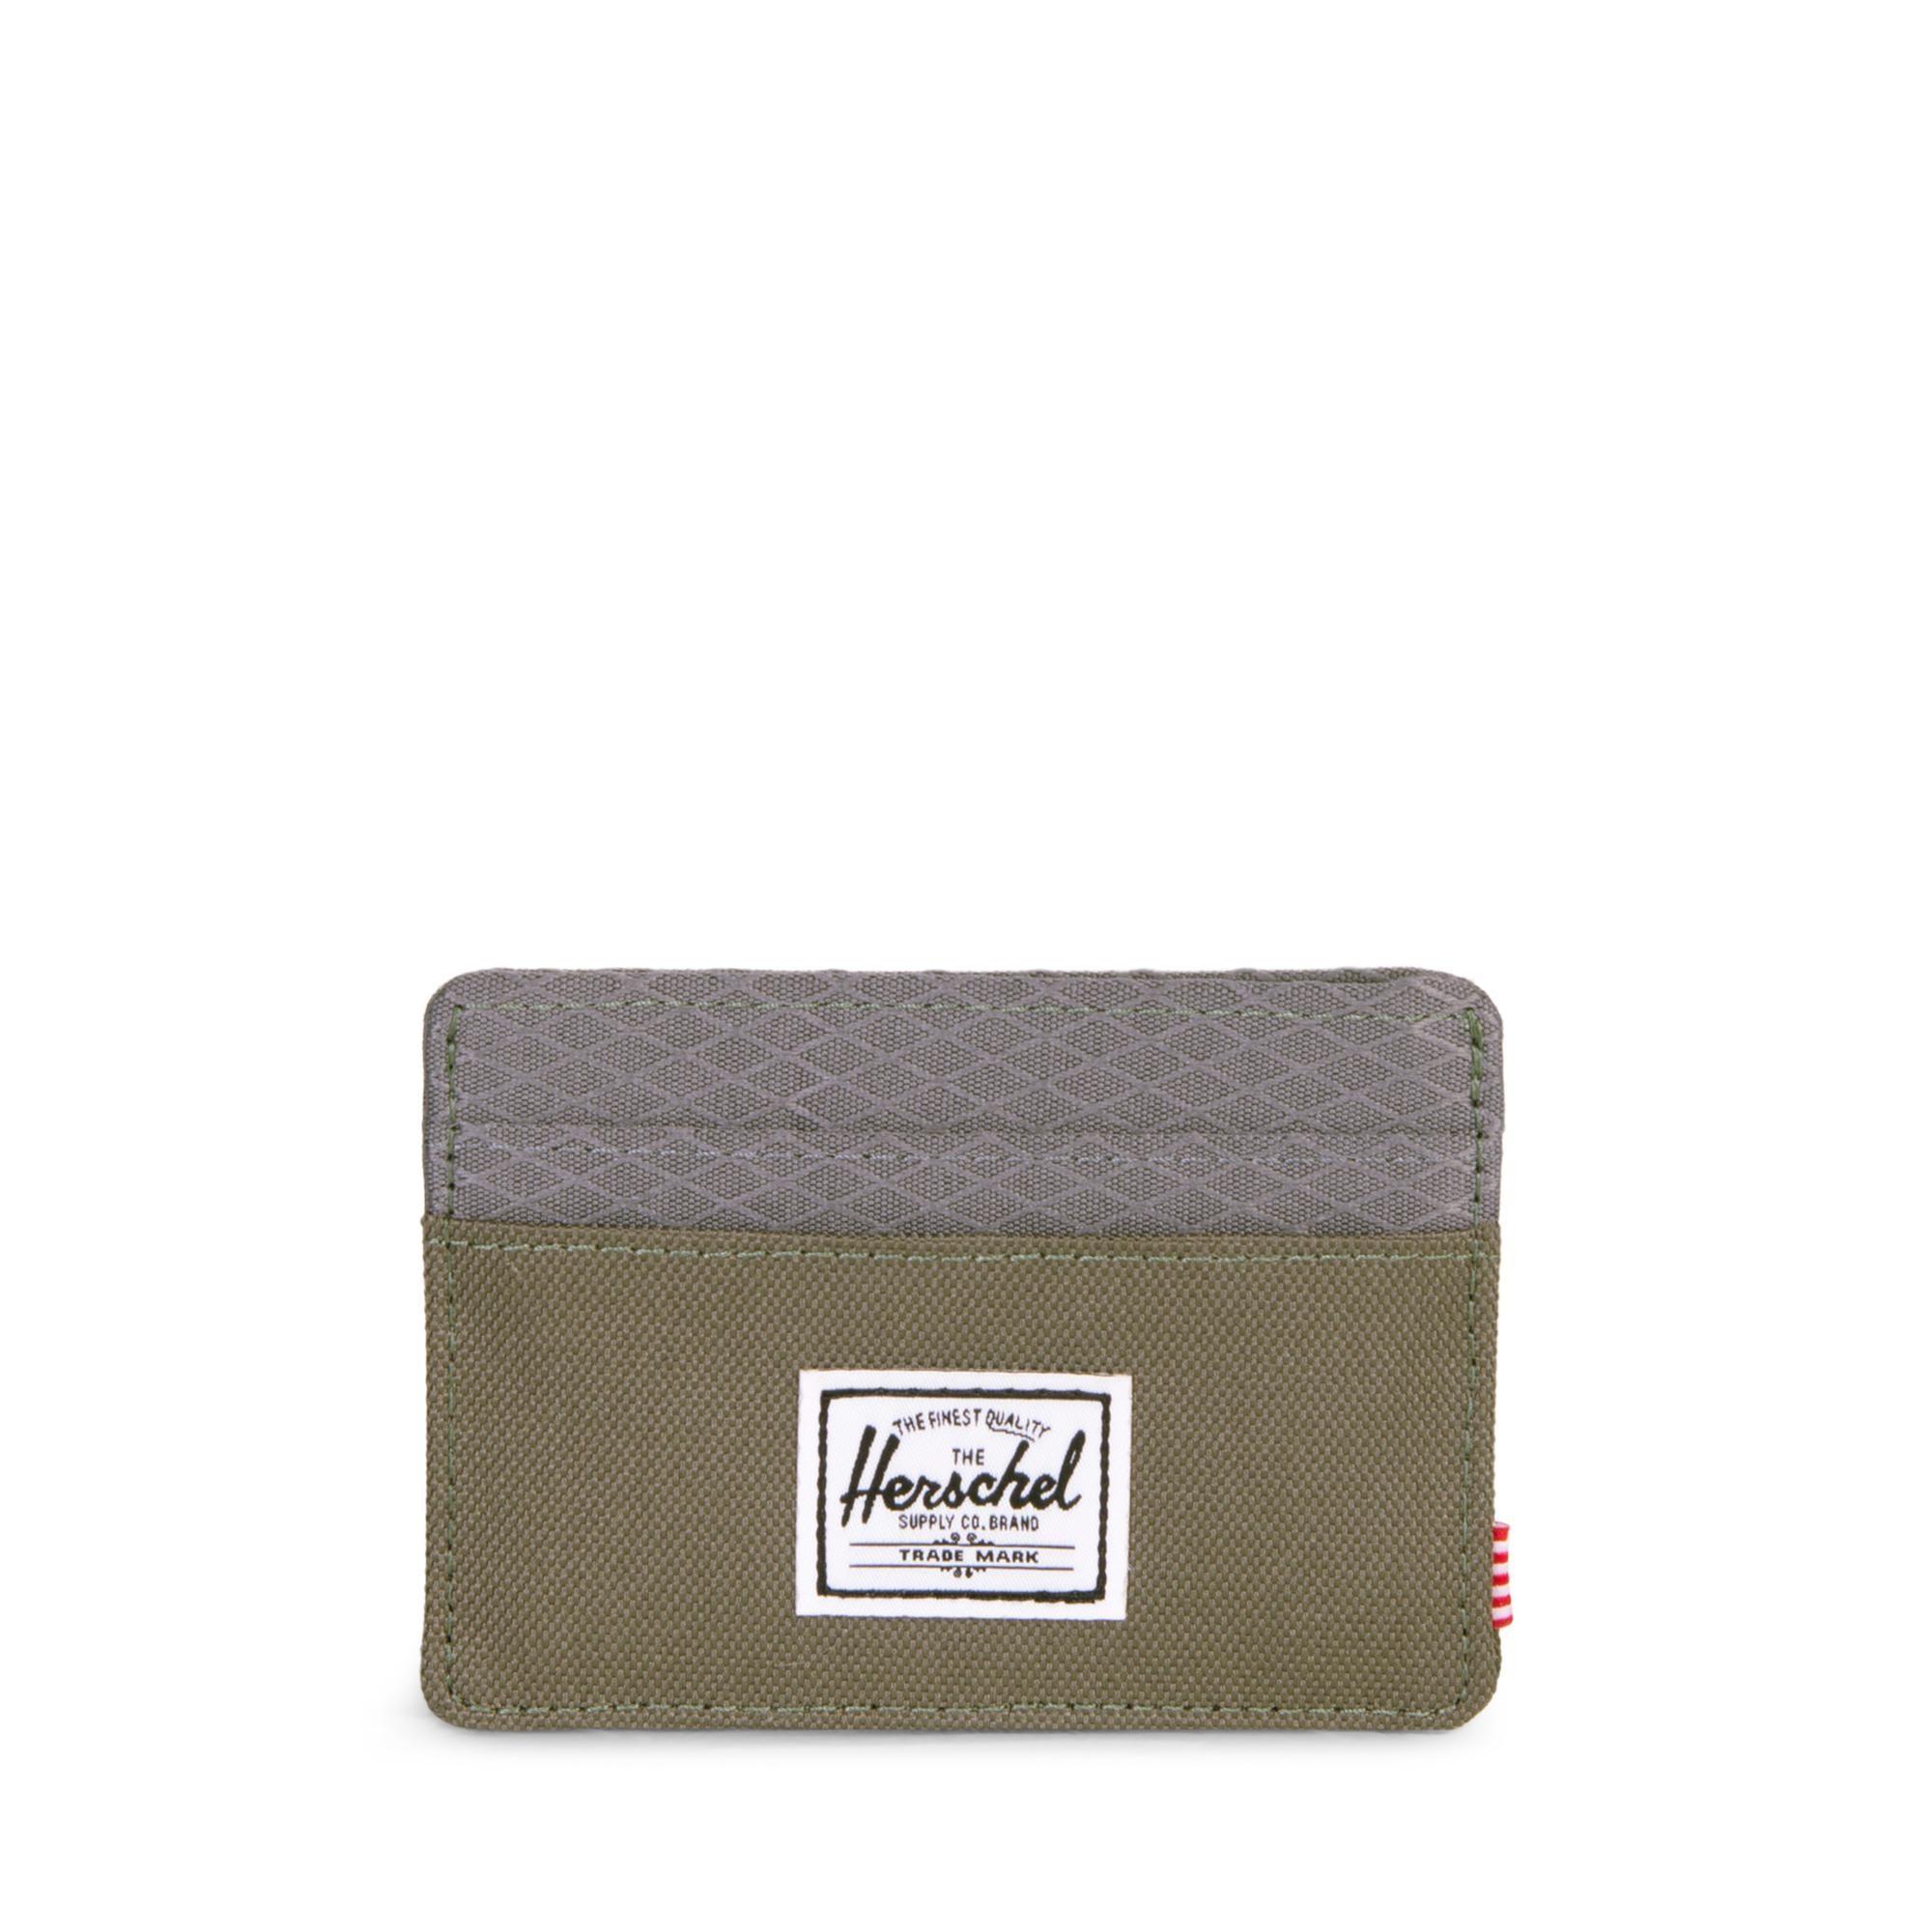 Herschel Charlie RFID - Ivy Green/Smoked Pearl